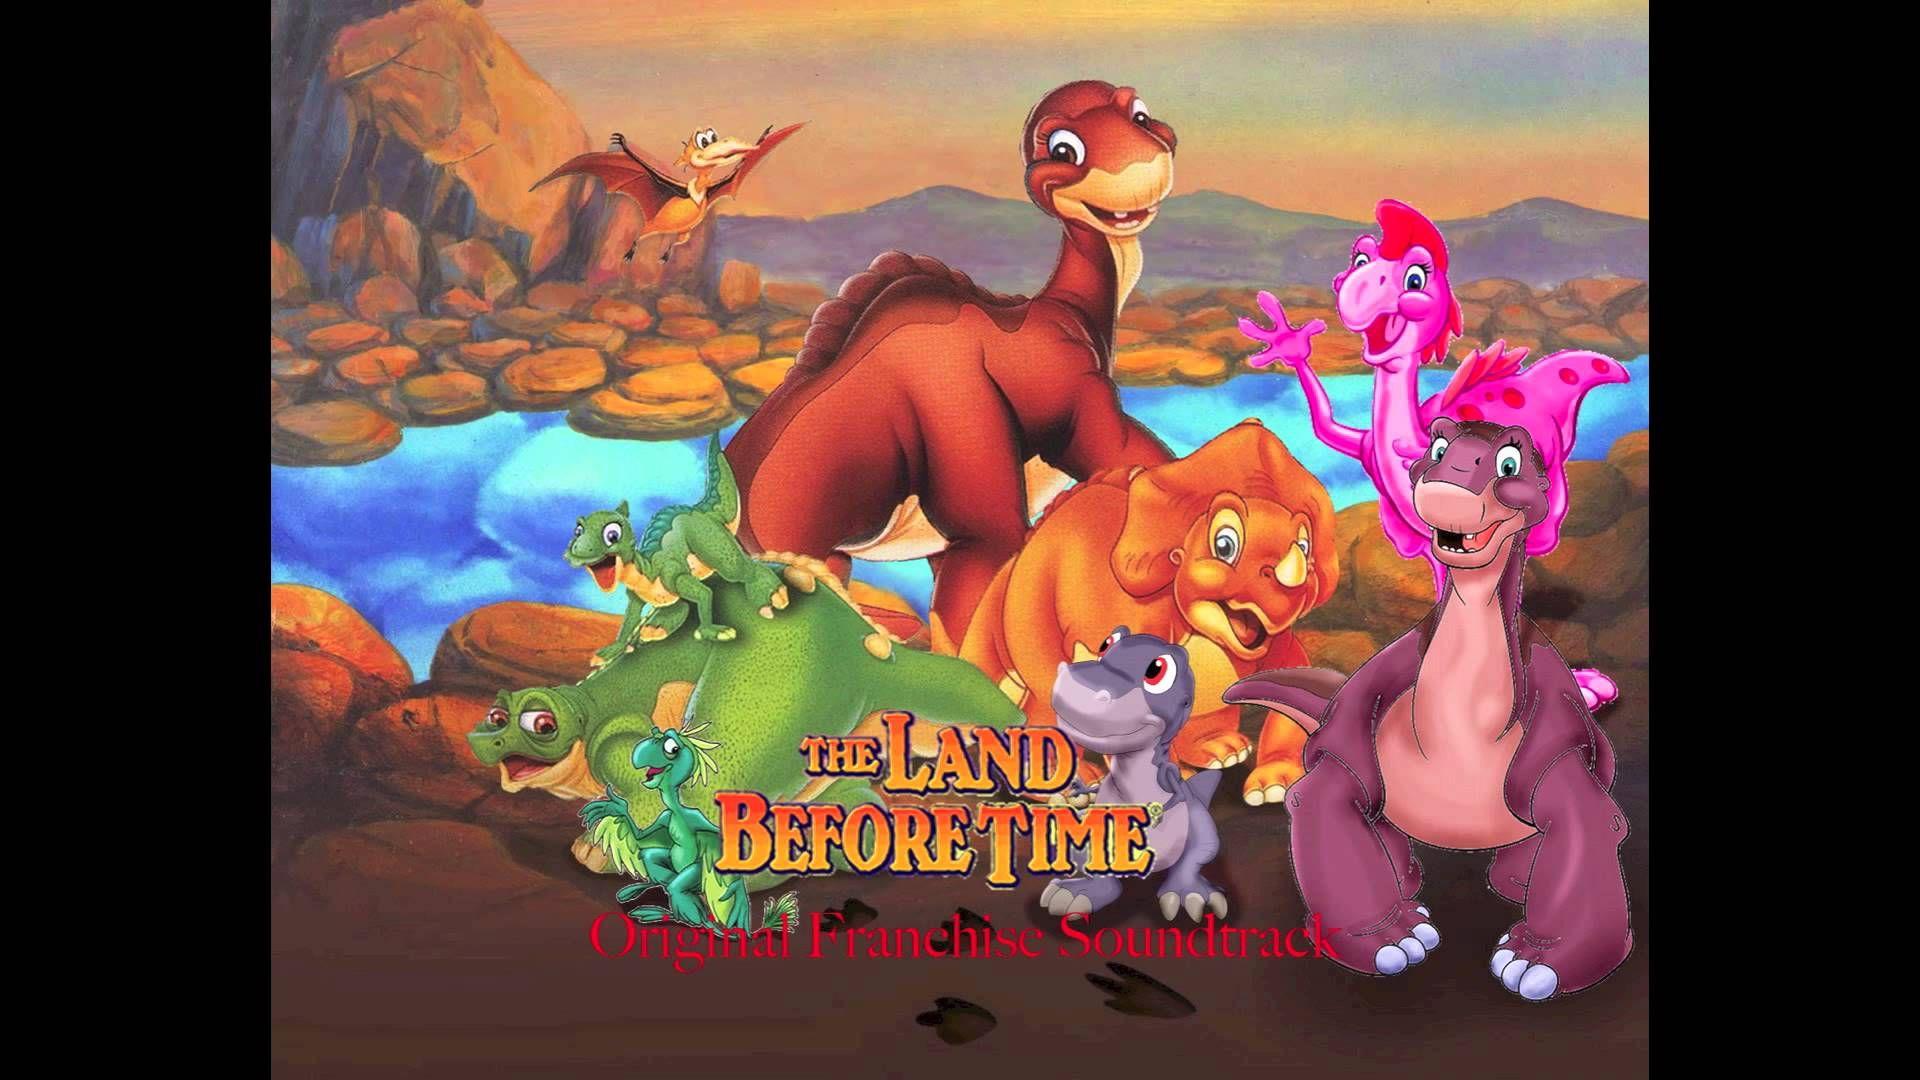 The Land Before Time Original Franchise Soundtrack Genesis B